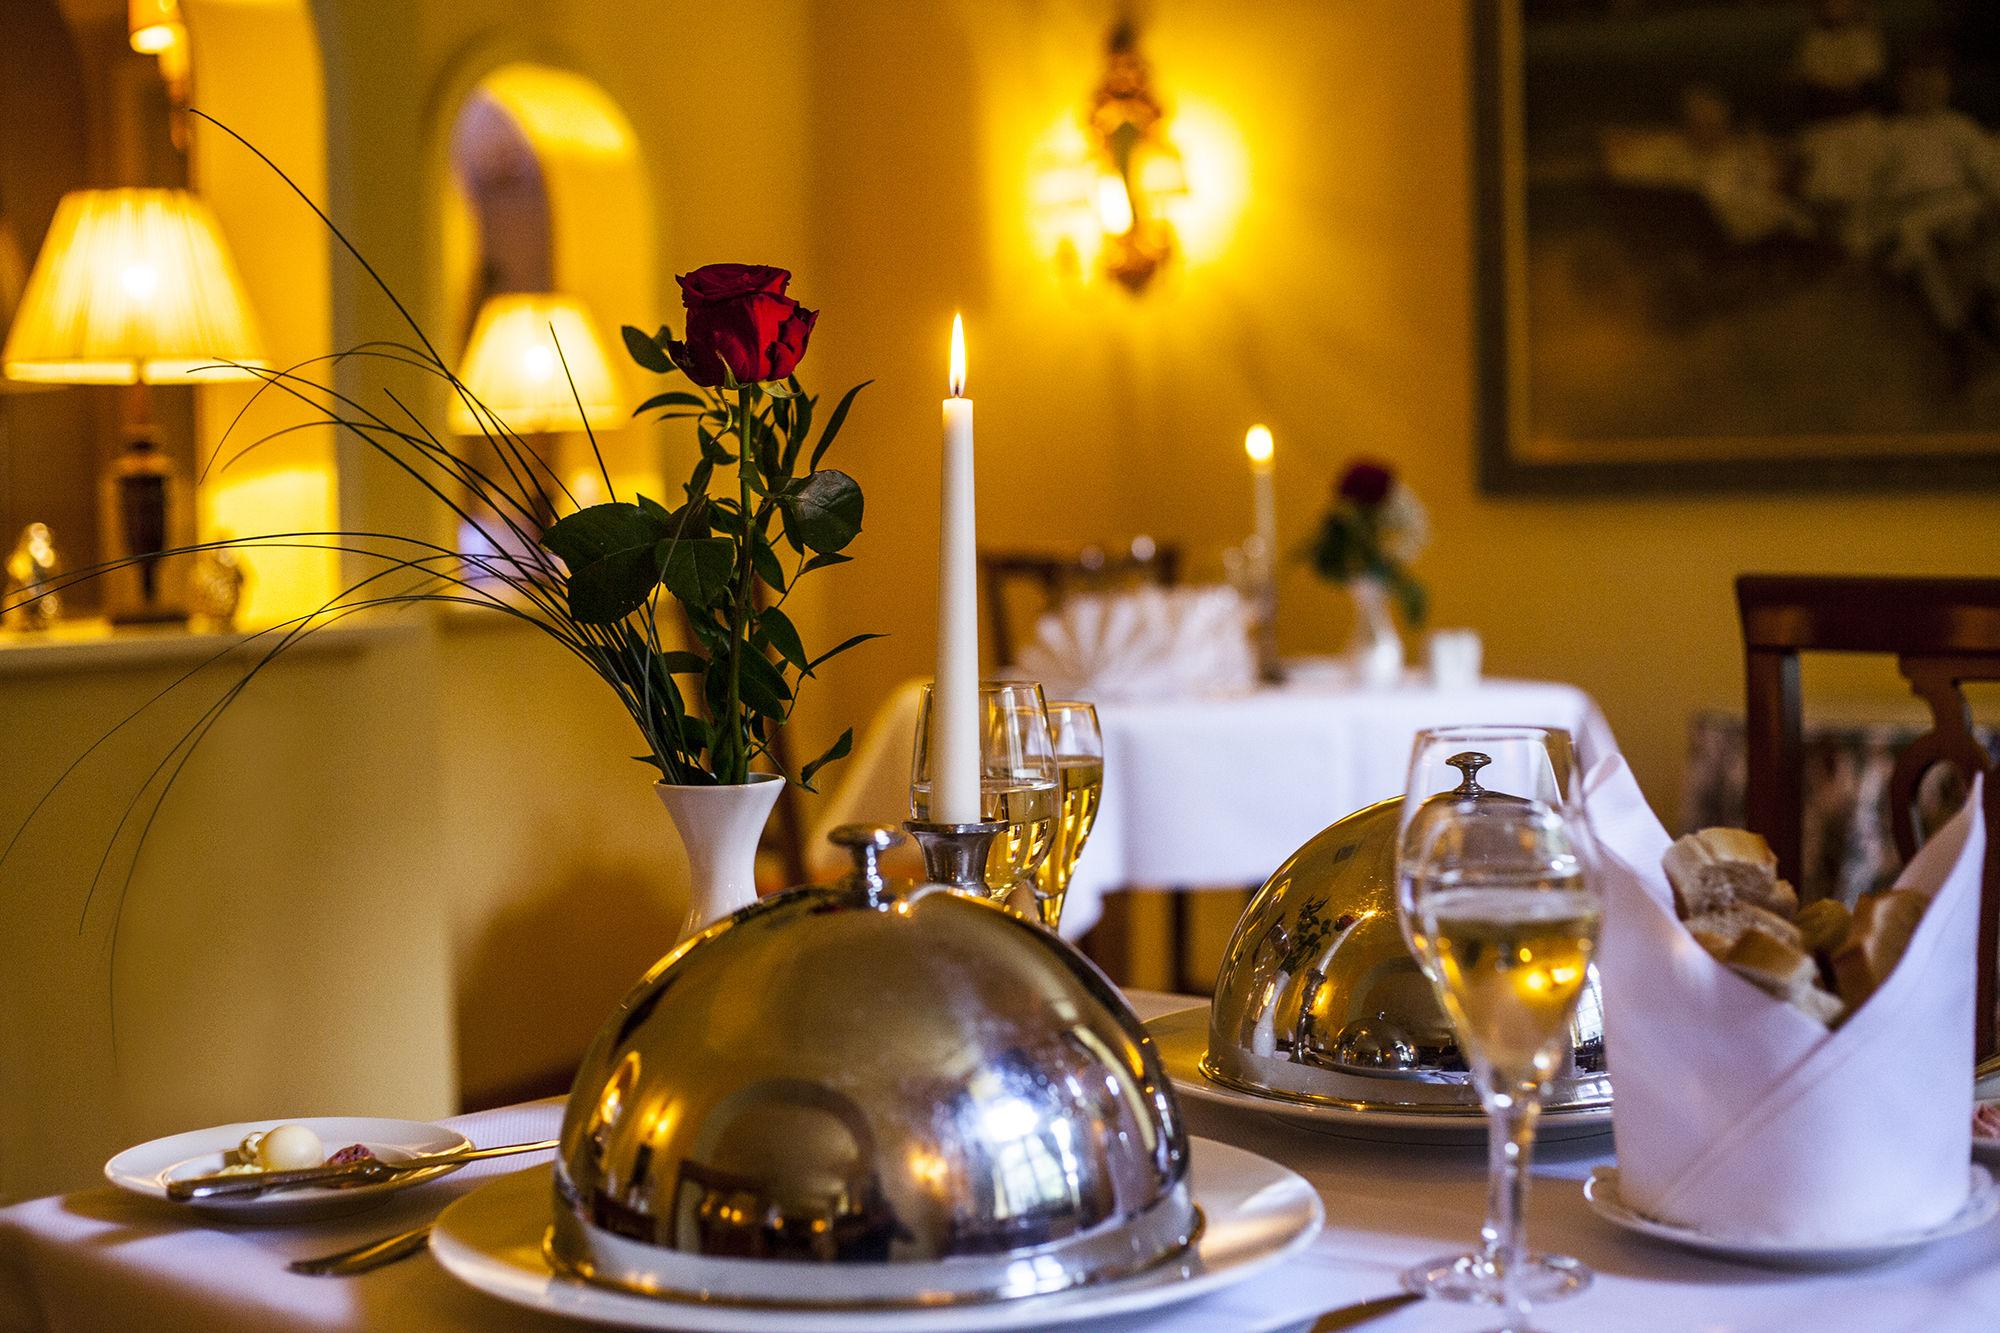 Restaurant Spreewald - Schloss Brandenburg - Spreewald erleben - Schloss Lübbenau im Spreewald